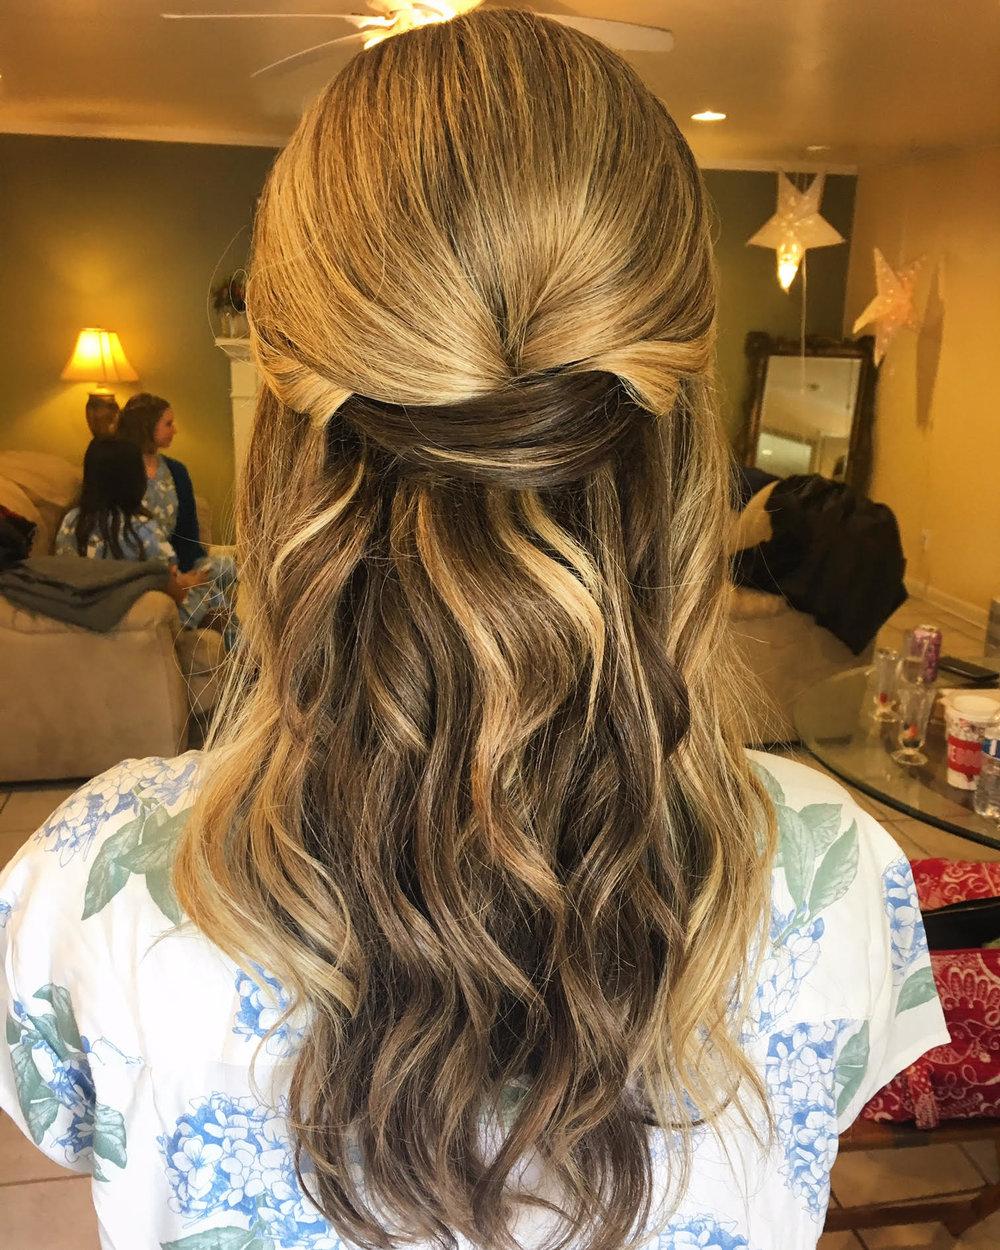 heir hair 10.jpg